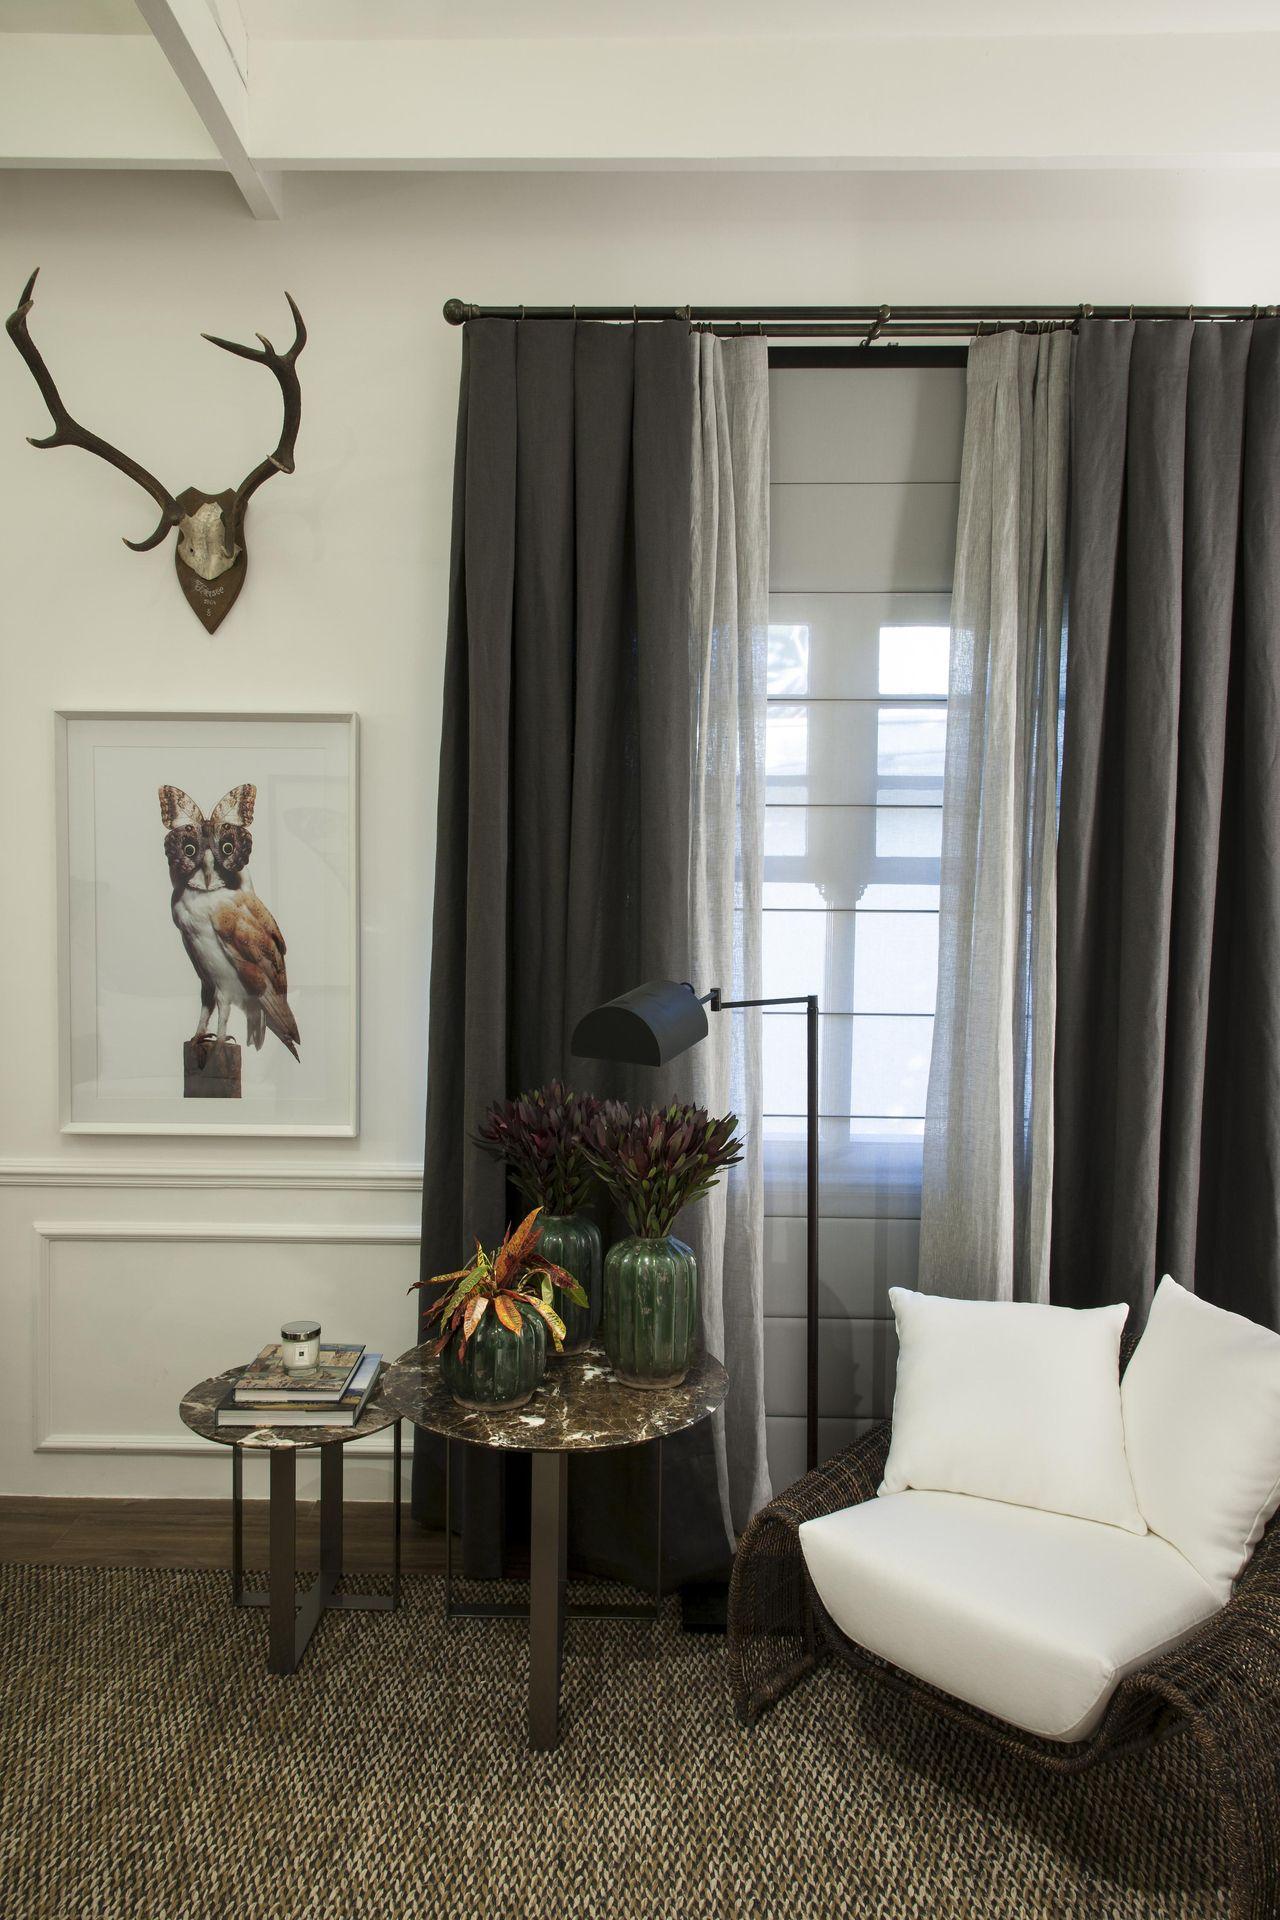 cortina cor cinza-escuro em sala